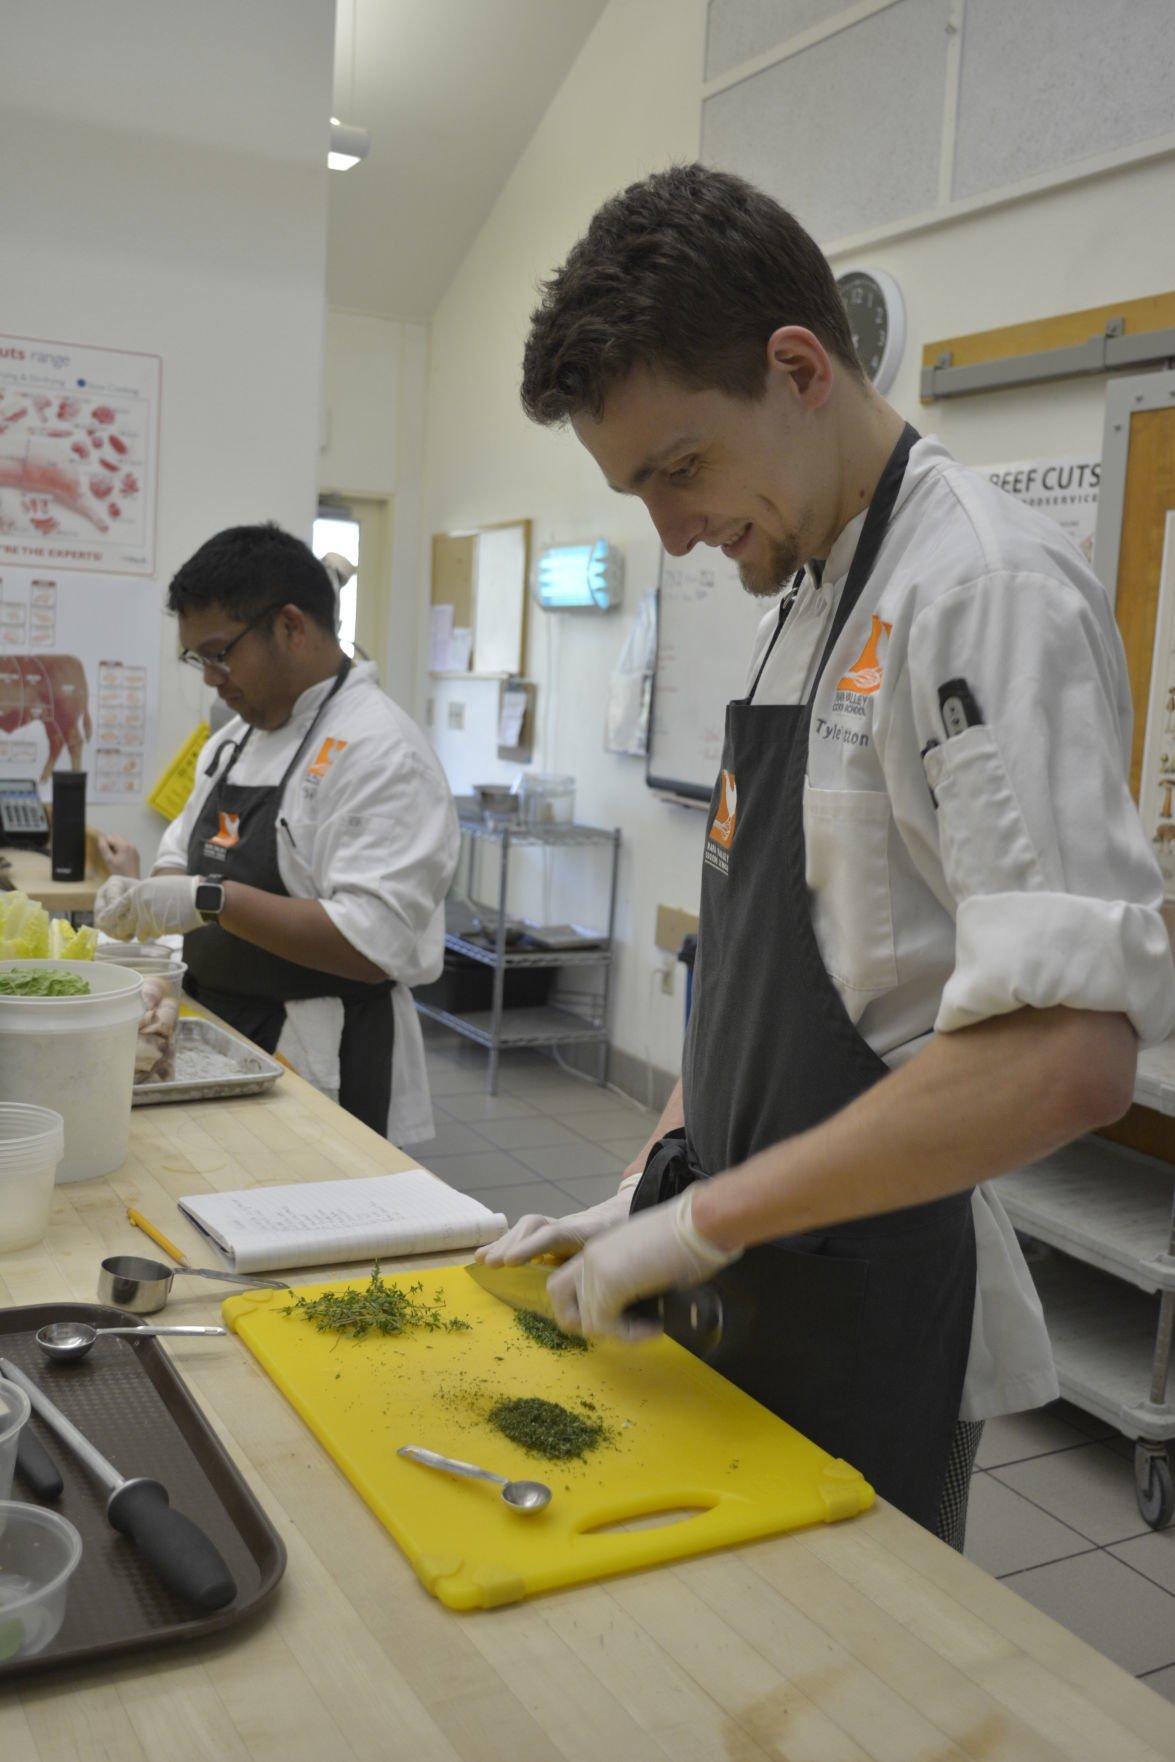 Napa Valley College Cooking School accelerates program